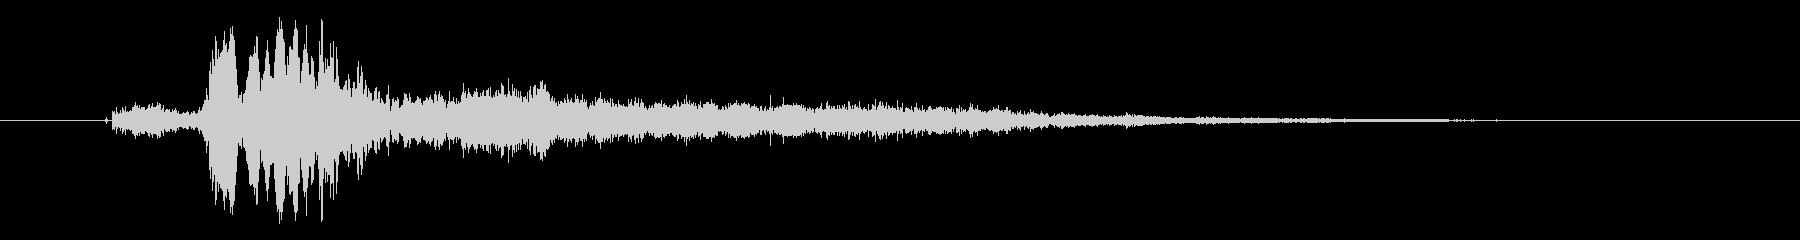 【SFXスクラッチ音止まる】シュルシュルの未再生の波形